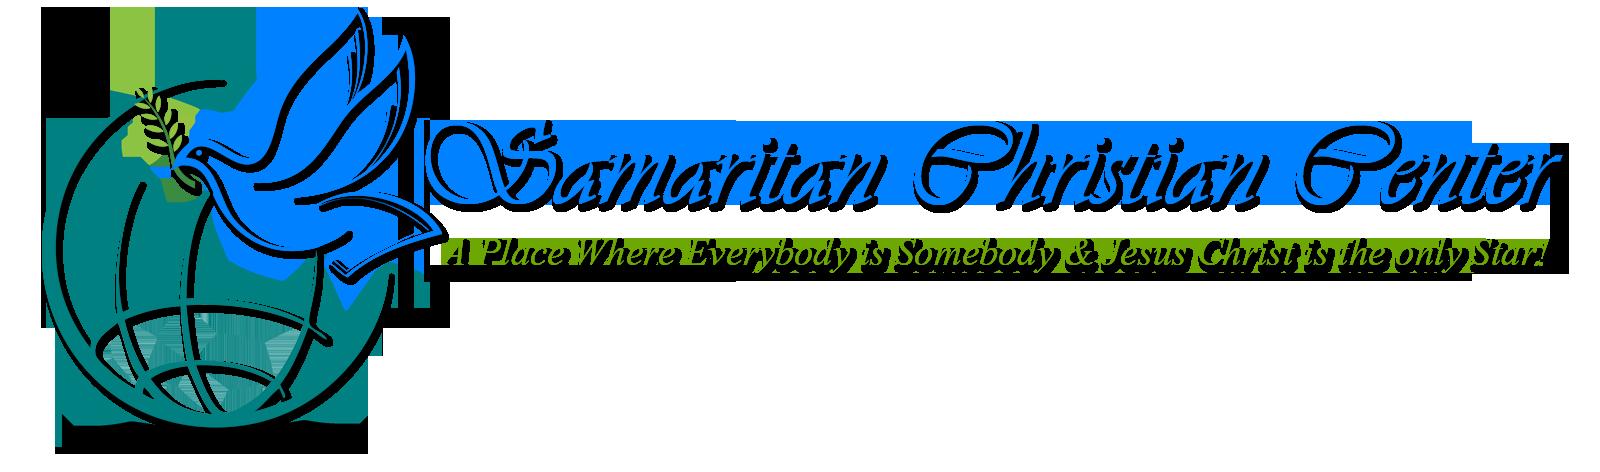 Logo-w-text-e1545237897839.png